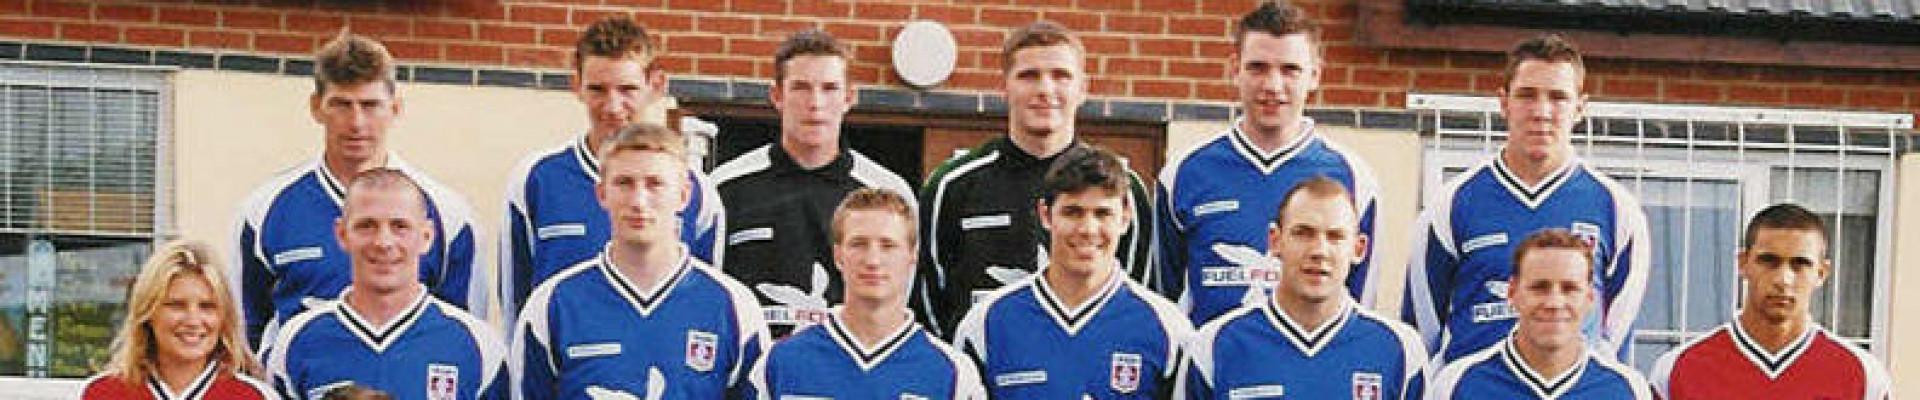 Team Photo 2002/03 Season